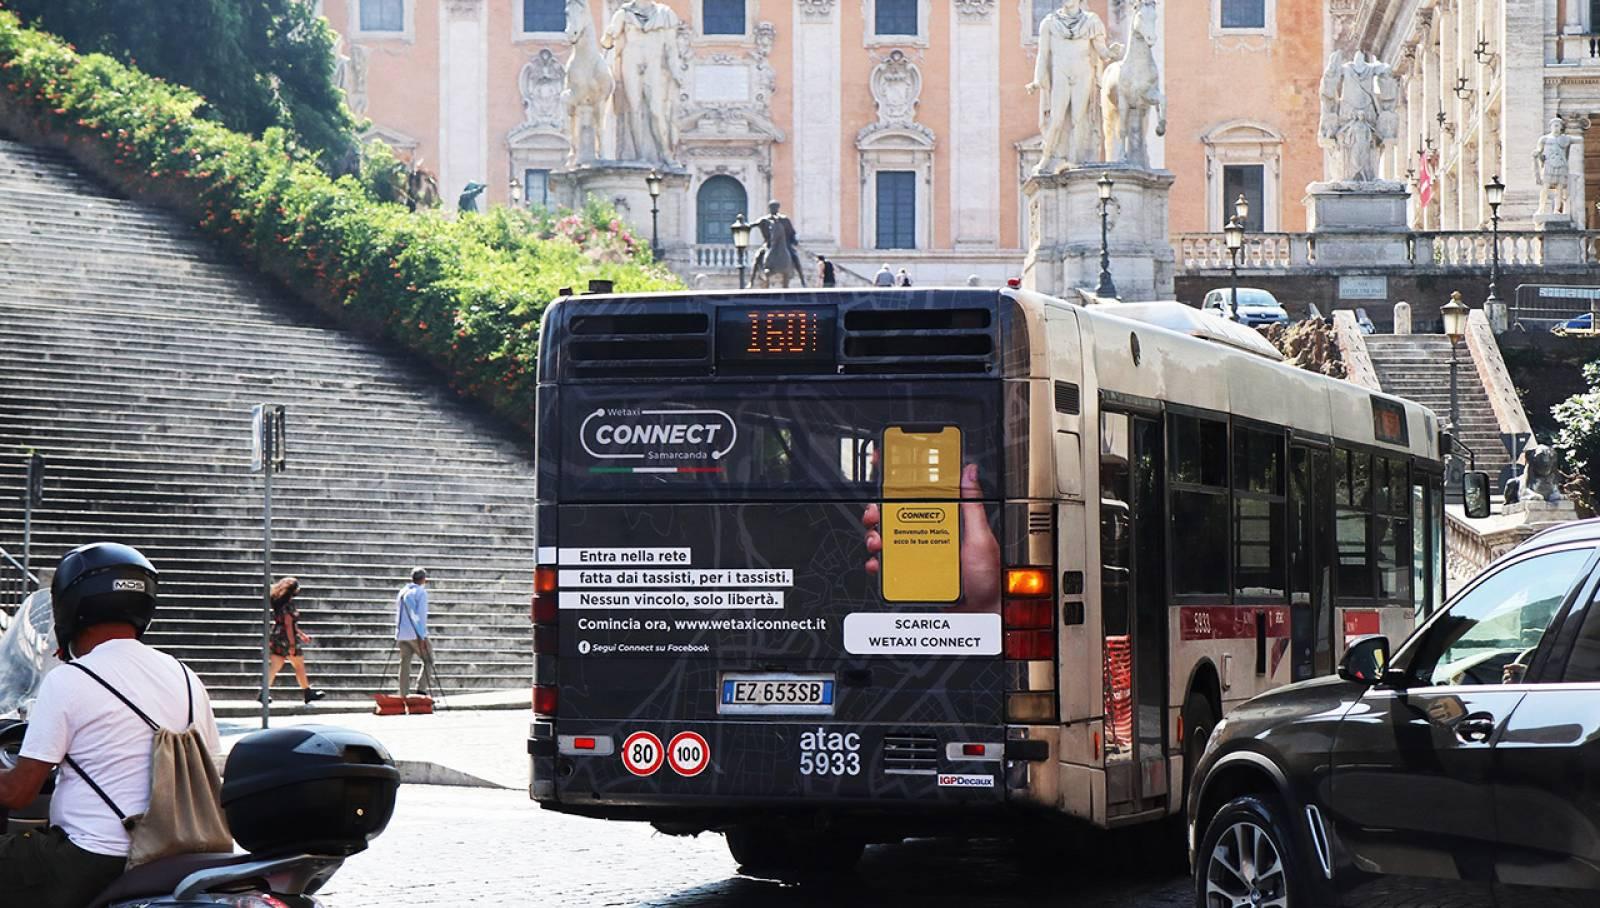 IGPDecaux Roma Fullback per WeTaxi